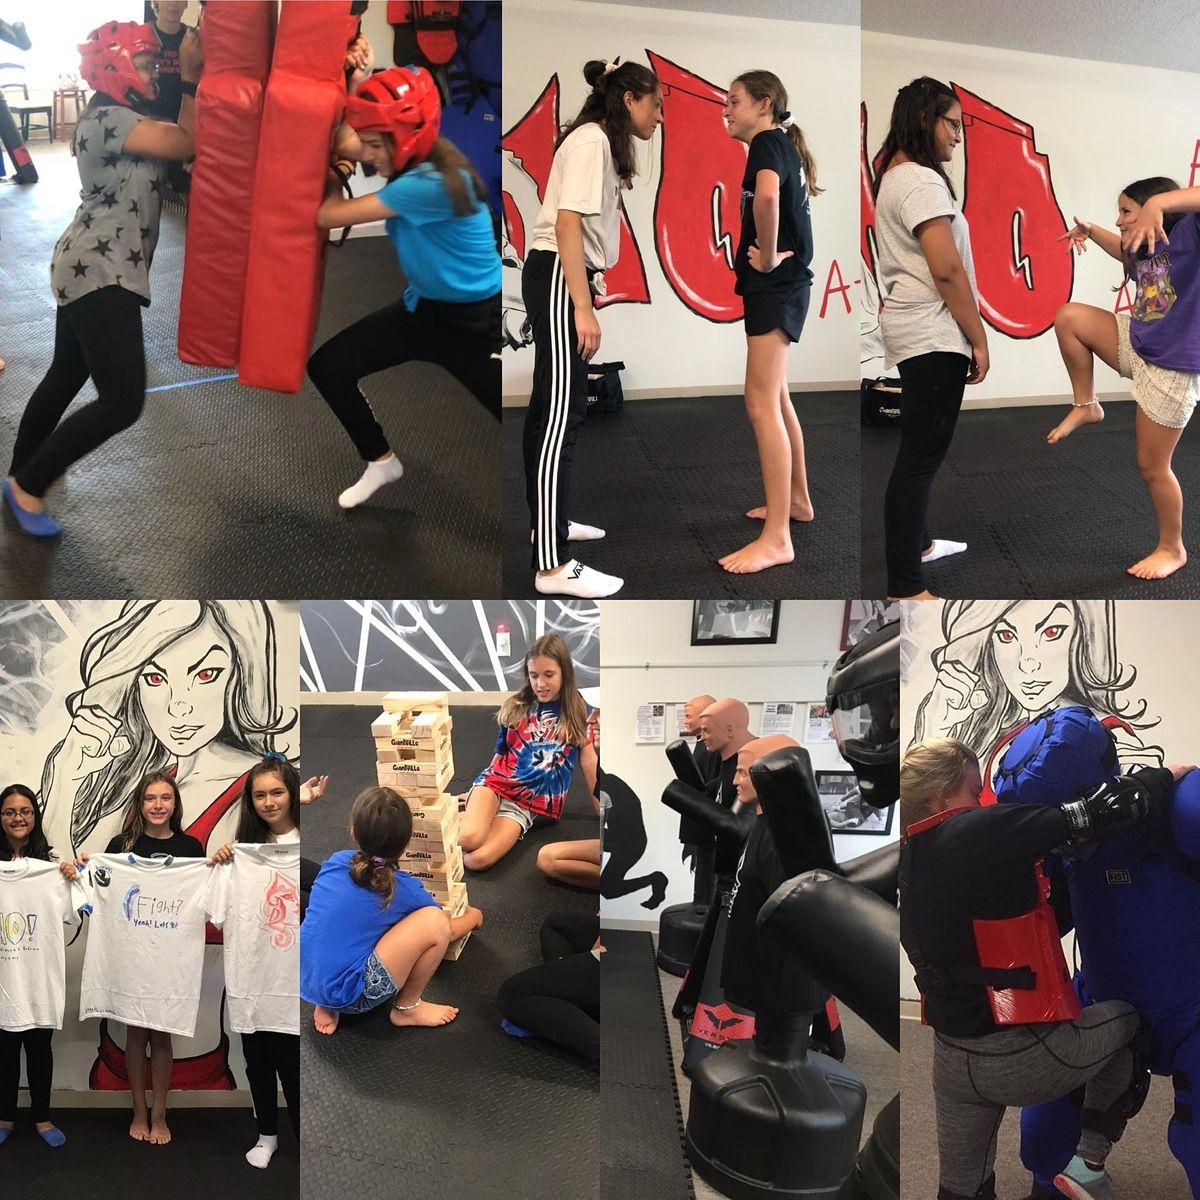 Girls Fight Summer Camp - June 28-July 2, 9:30am-3pm